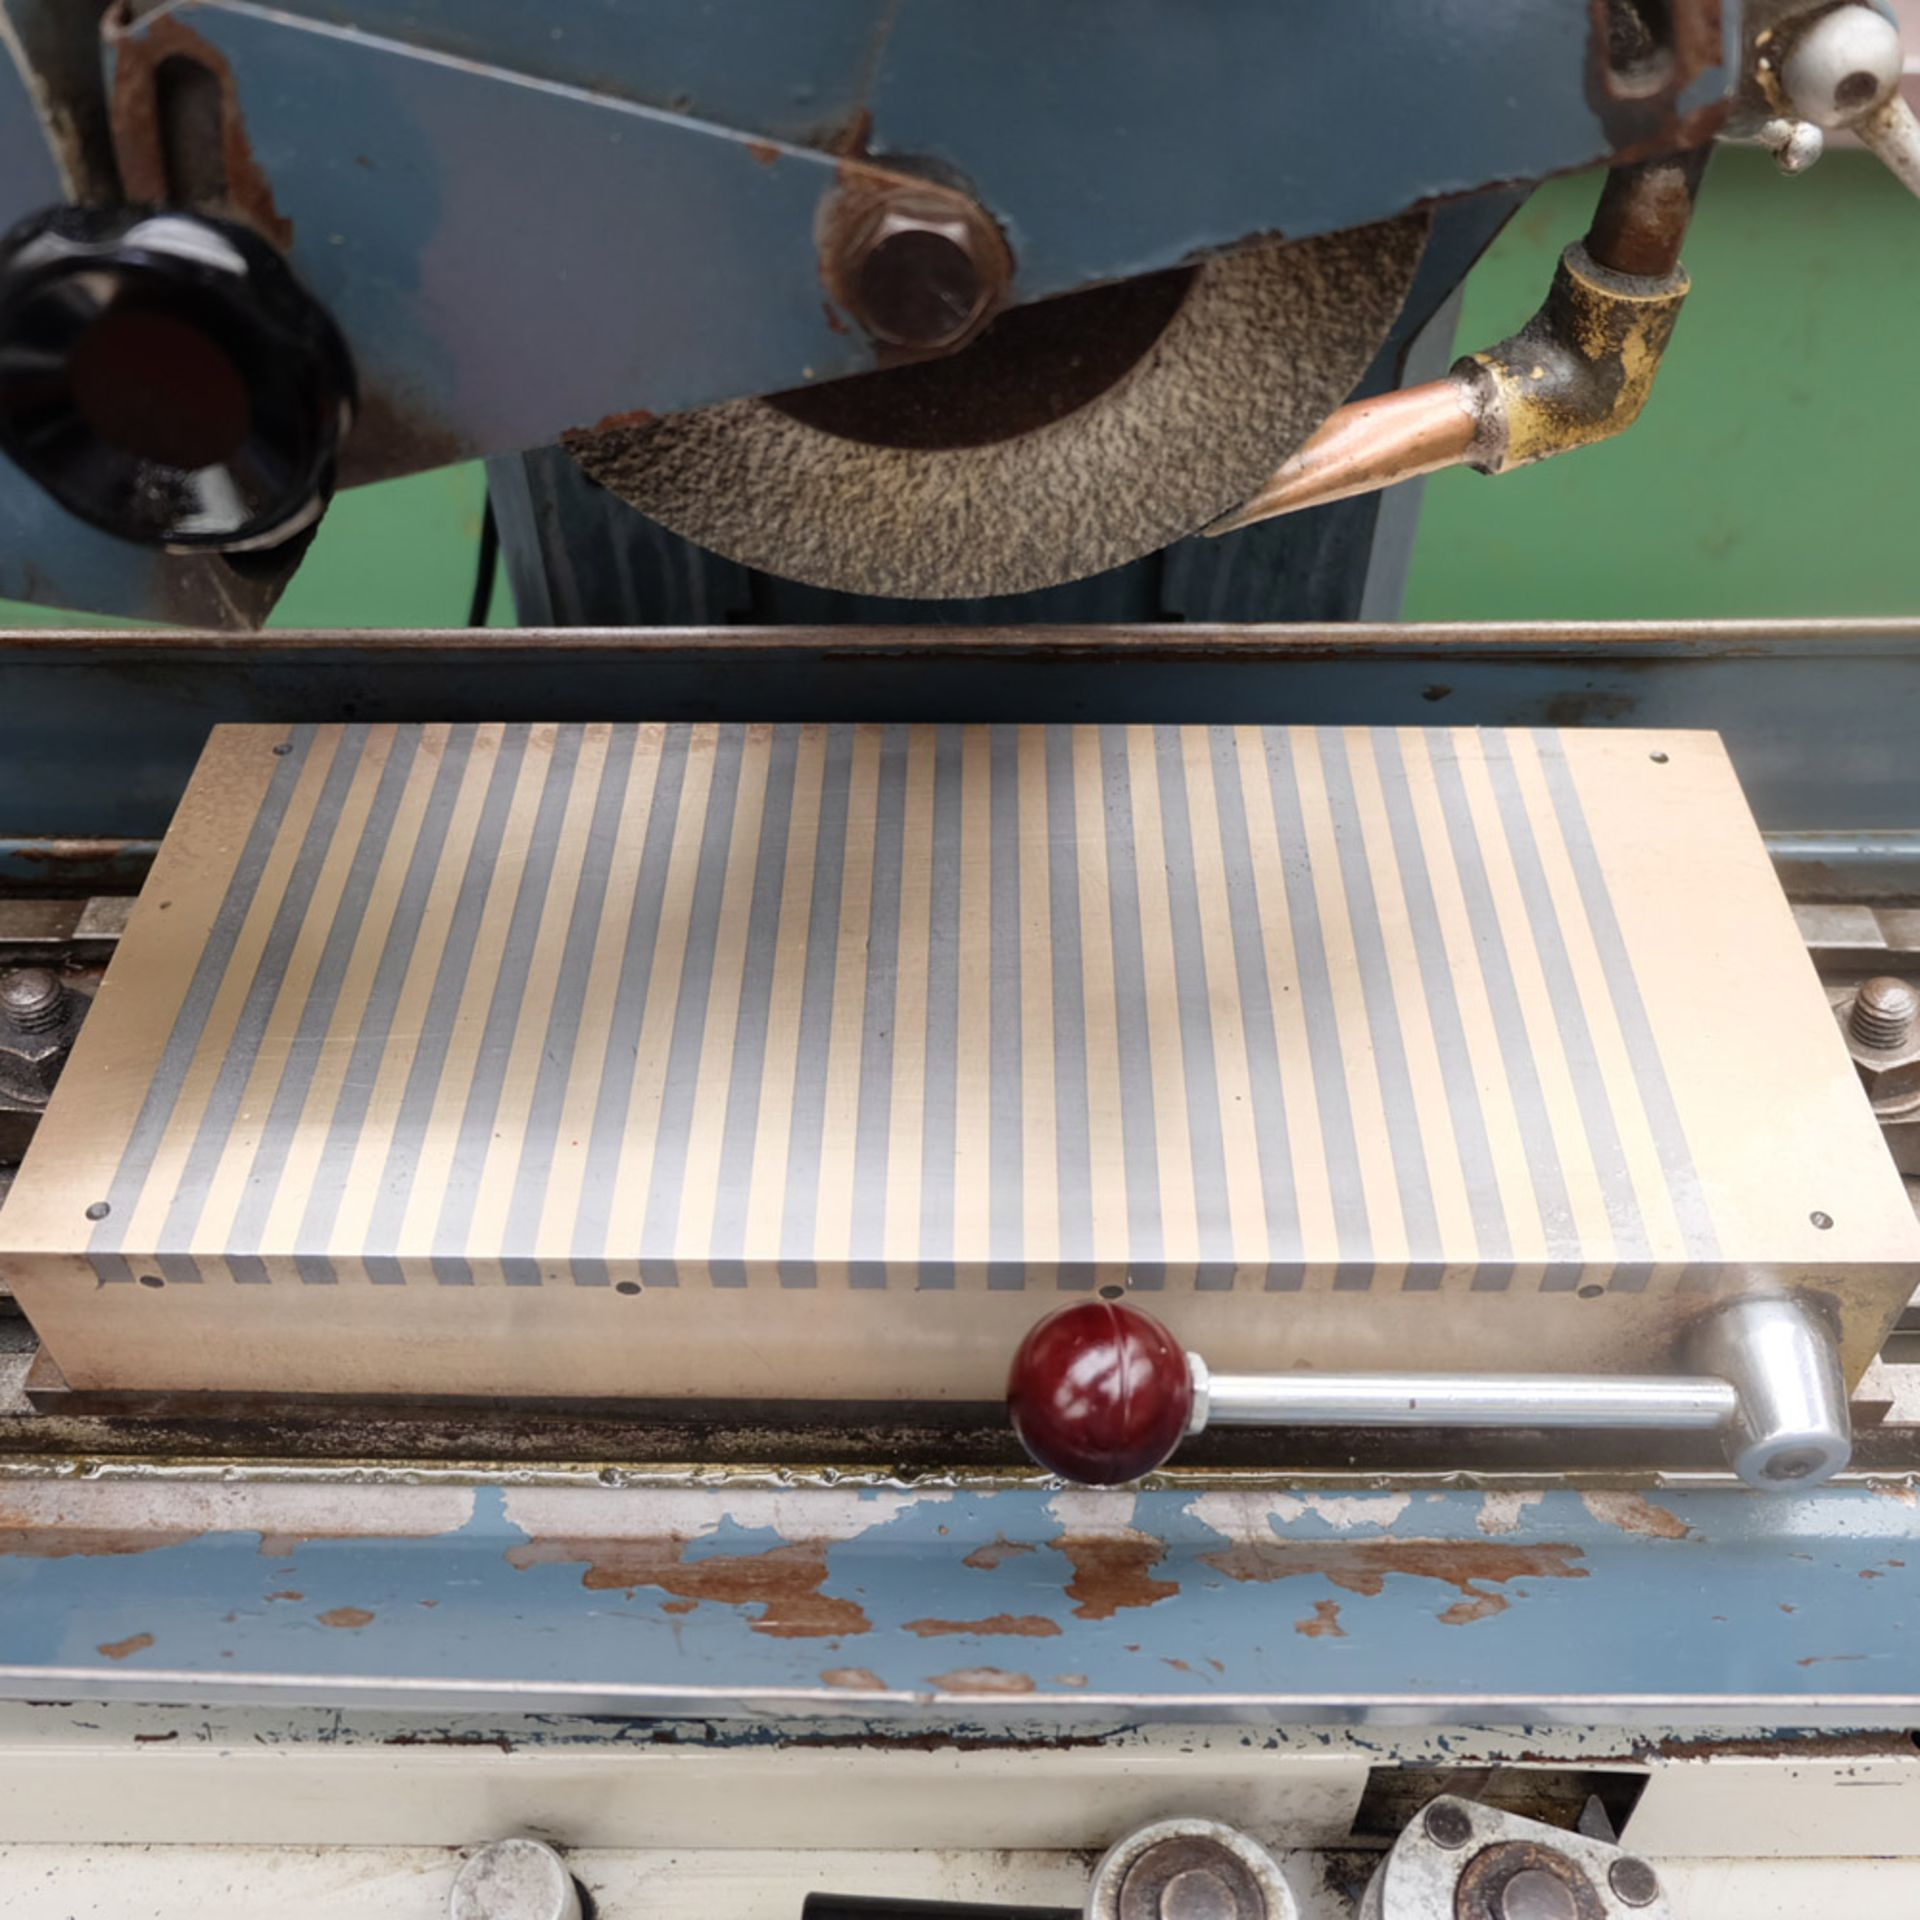 "Jones & Shipman 540P Tool Room Surface Grinder. Capacity 18"" x 6"". - Image 2 of 7"